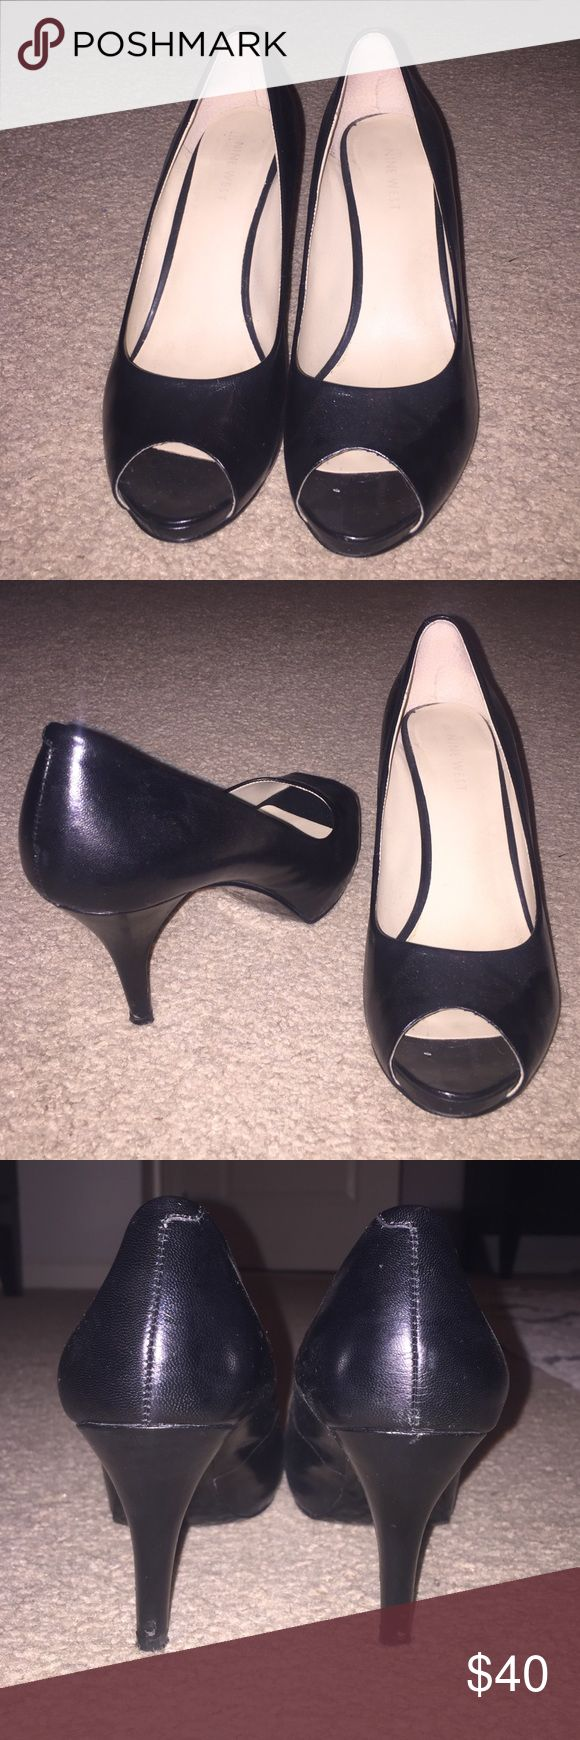 Nine West Peep Toe Pumps Black Nine West Peep Toe Pumps. Only worn a few times. Nine West Shoes Heels